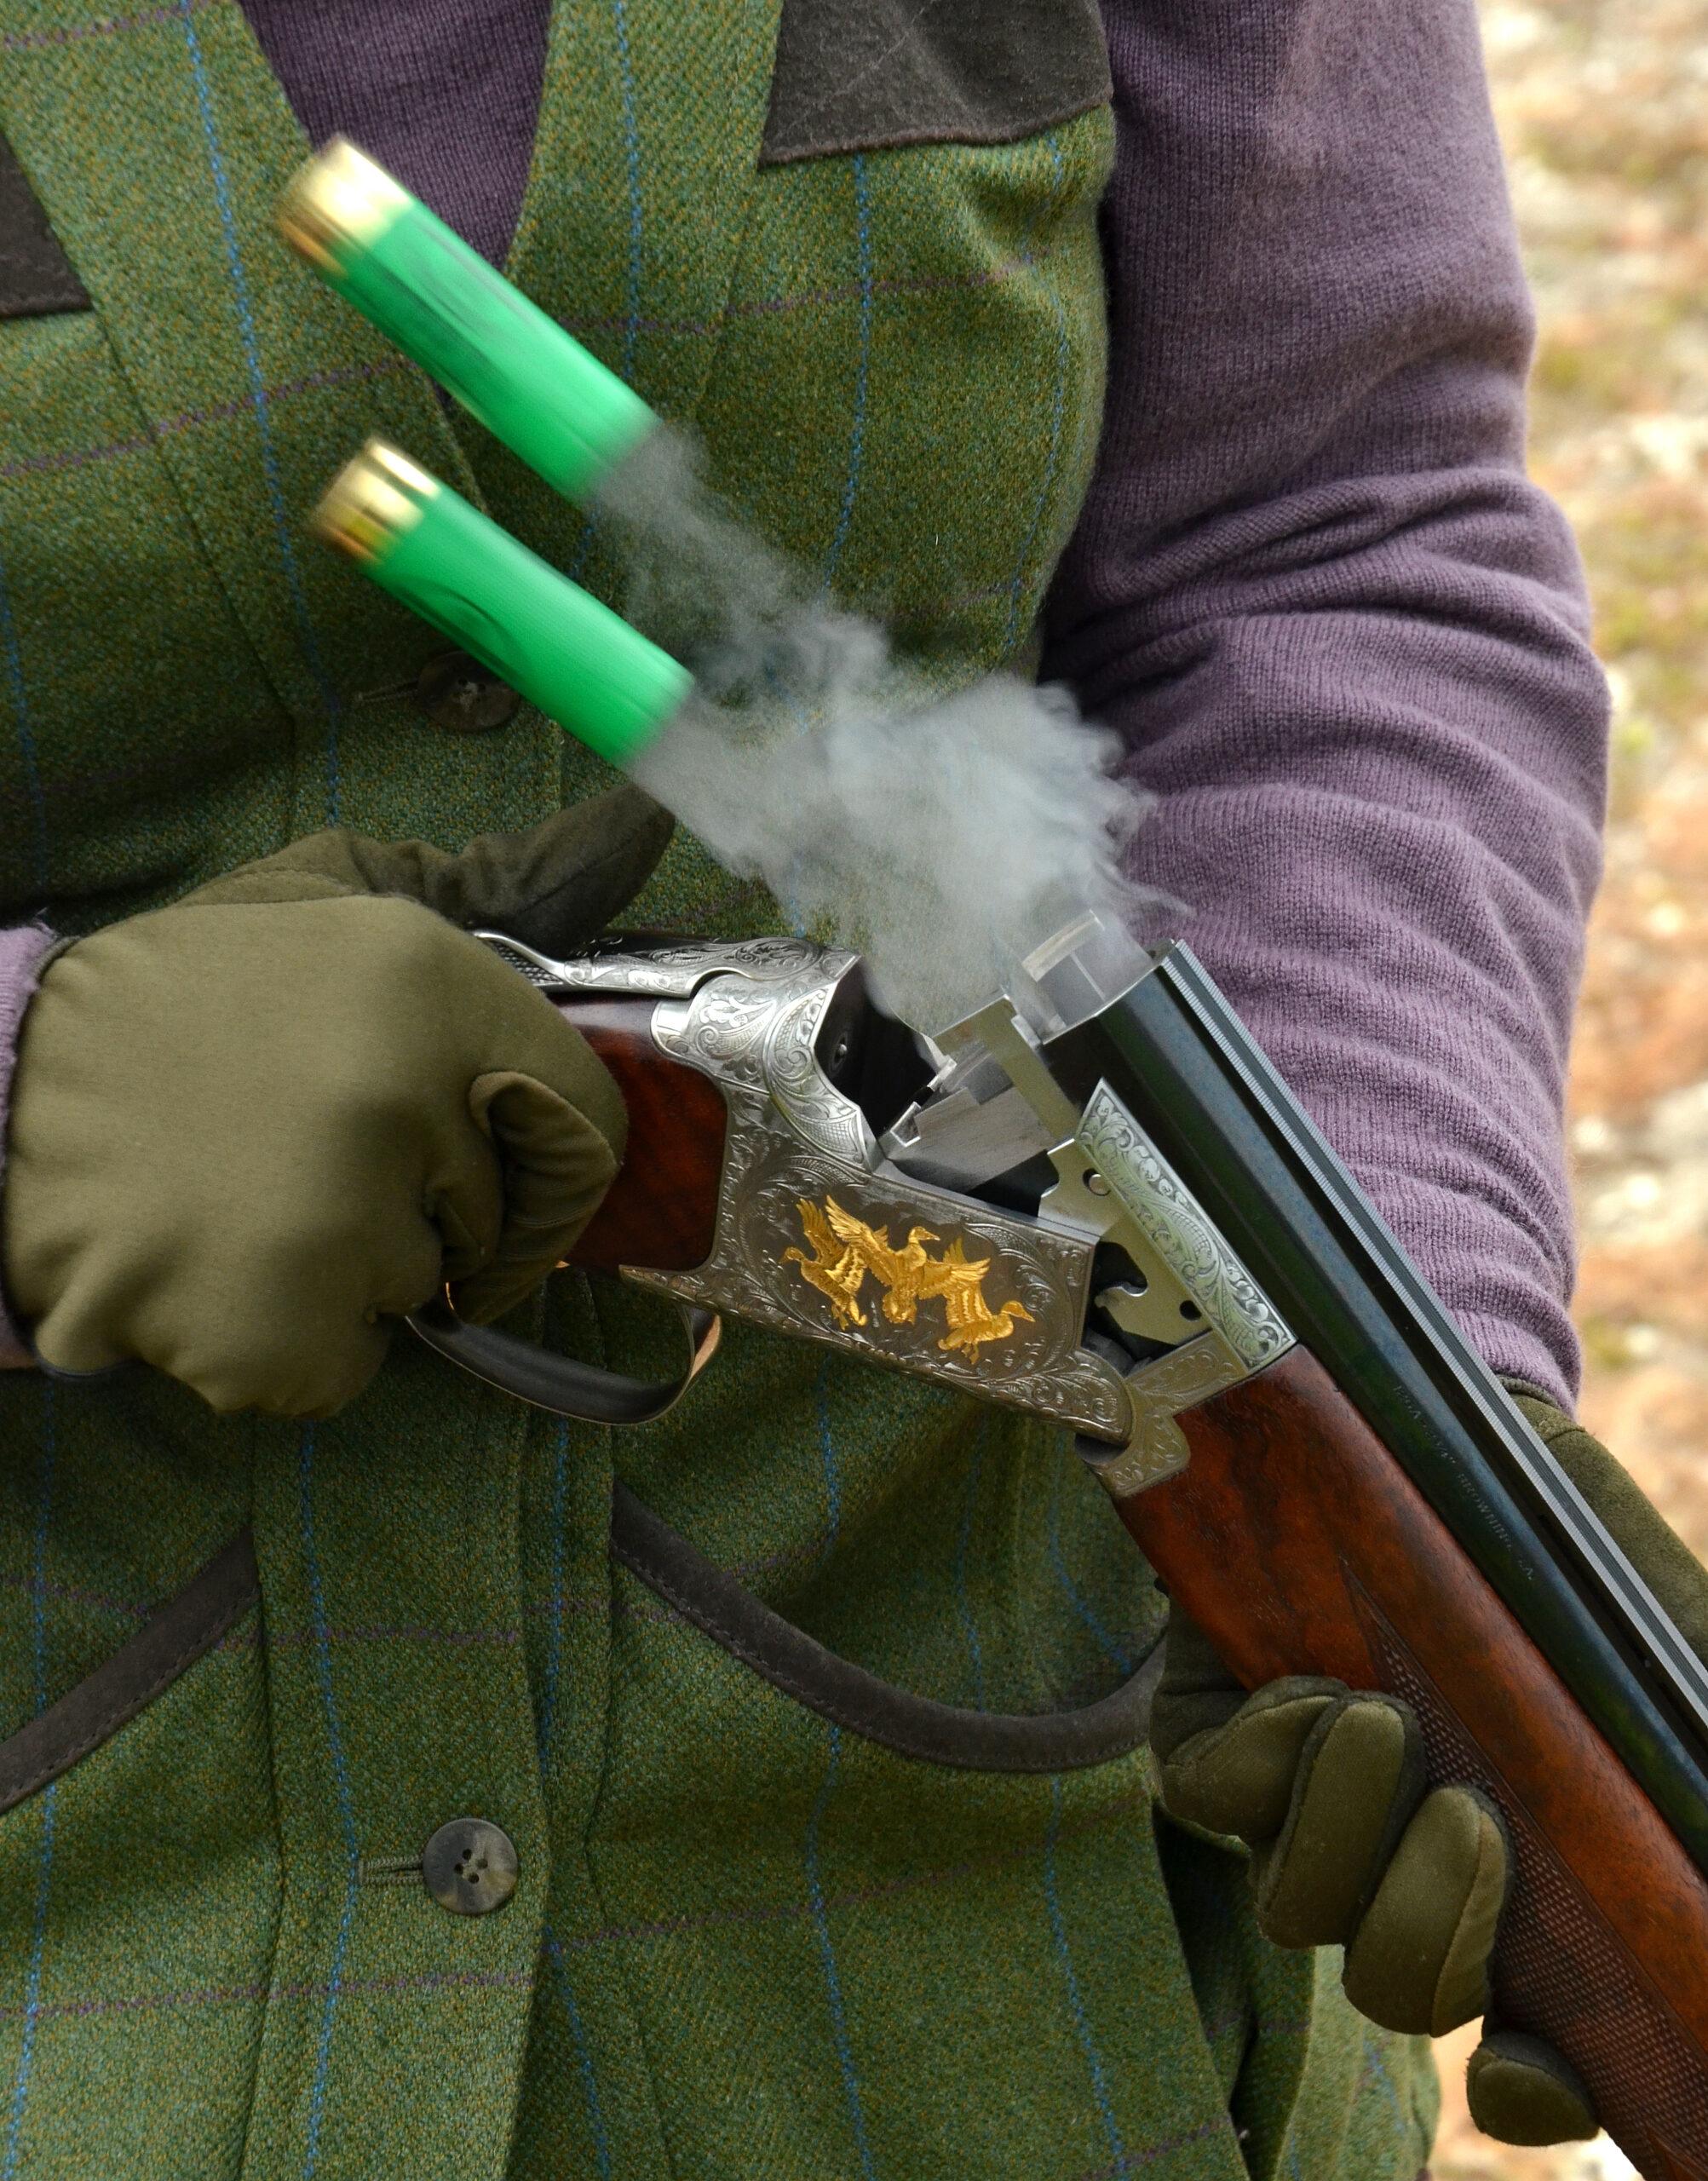 shotgun cartridges | shotgun and firearms applications and renewals medical reports | Shotgun Medicals